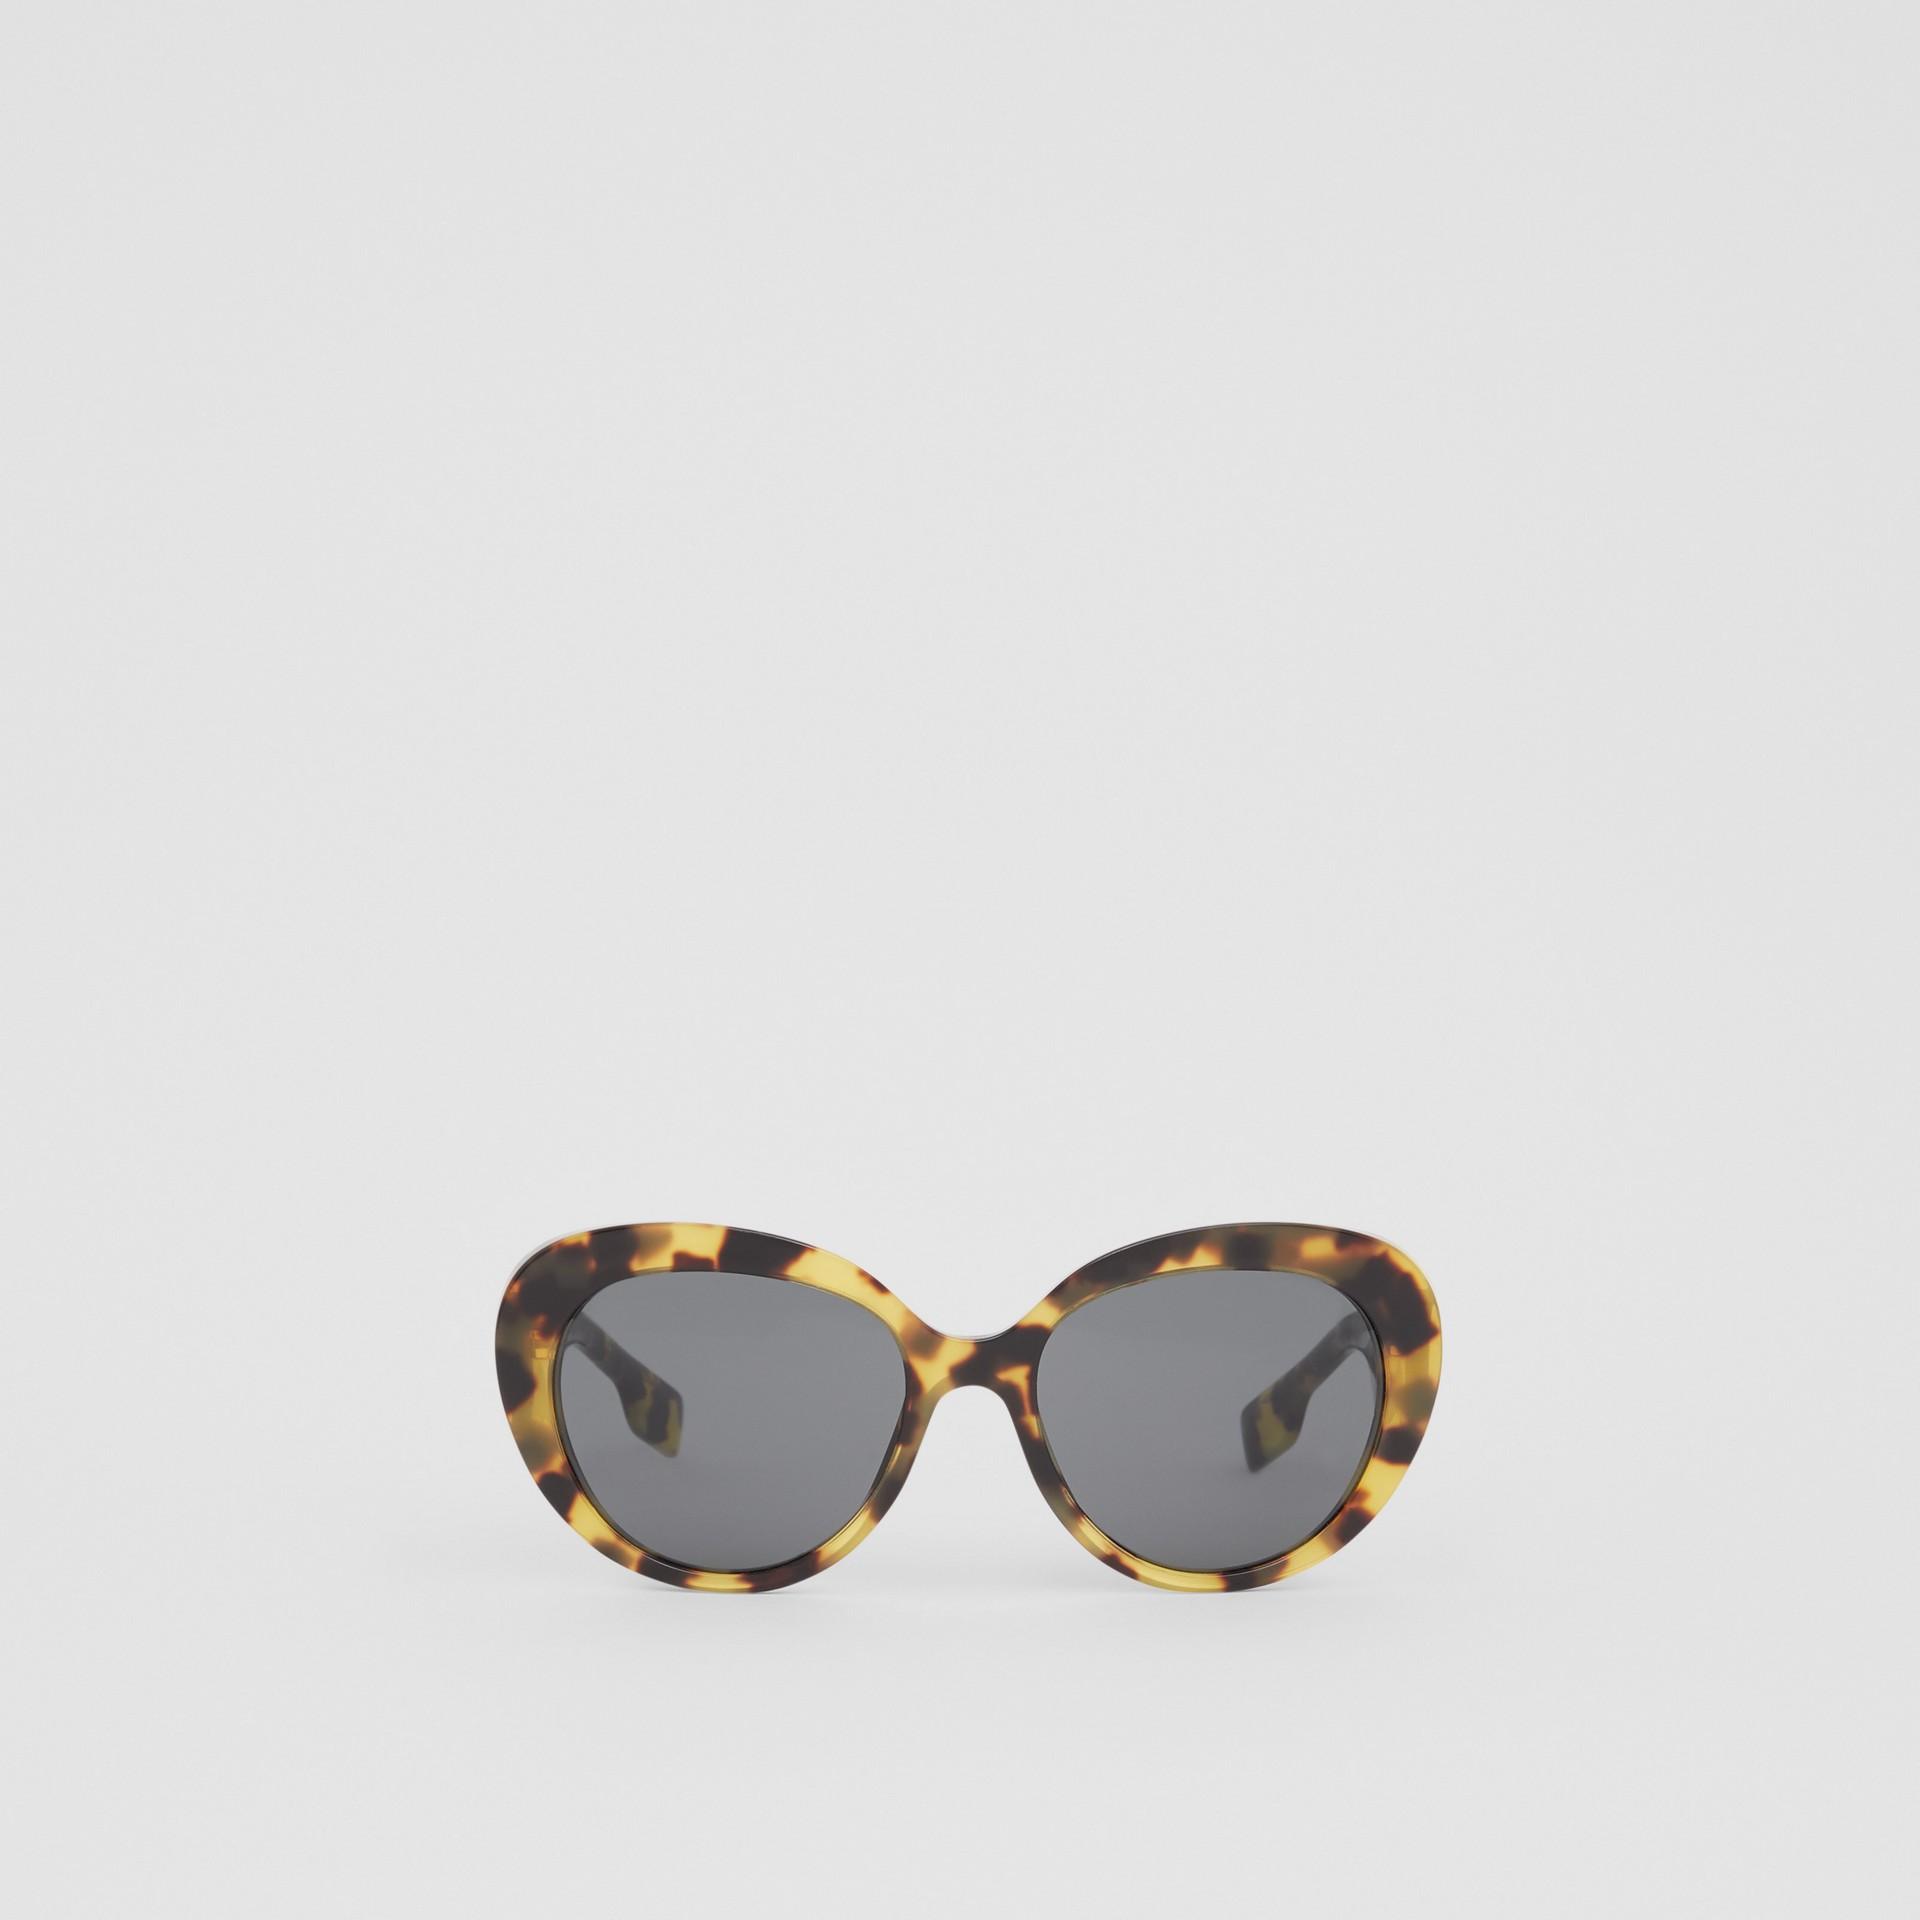 Monogram Motif Cat-eye Frame Sunglasses in Bright Tortoiseshell - Women | Burberry United Kingdom - gallery image 0